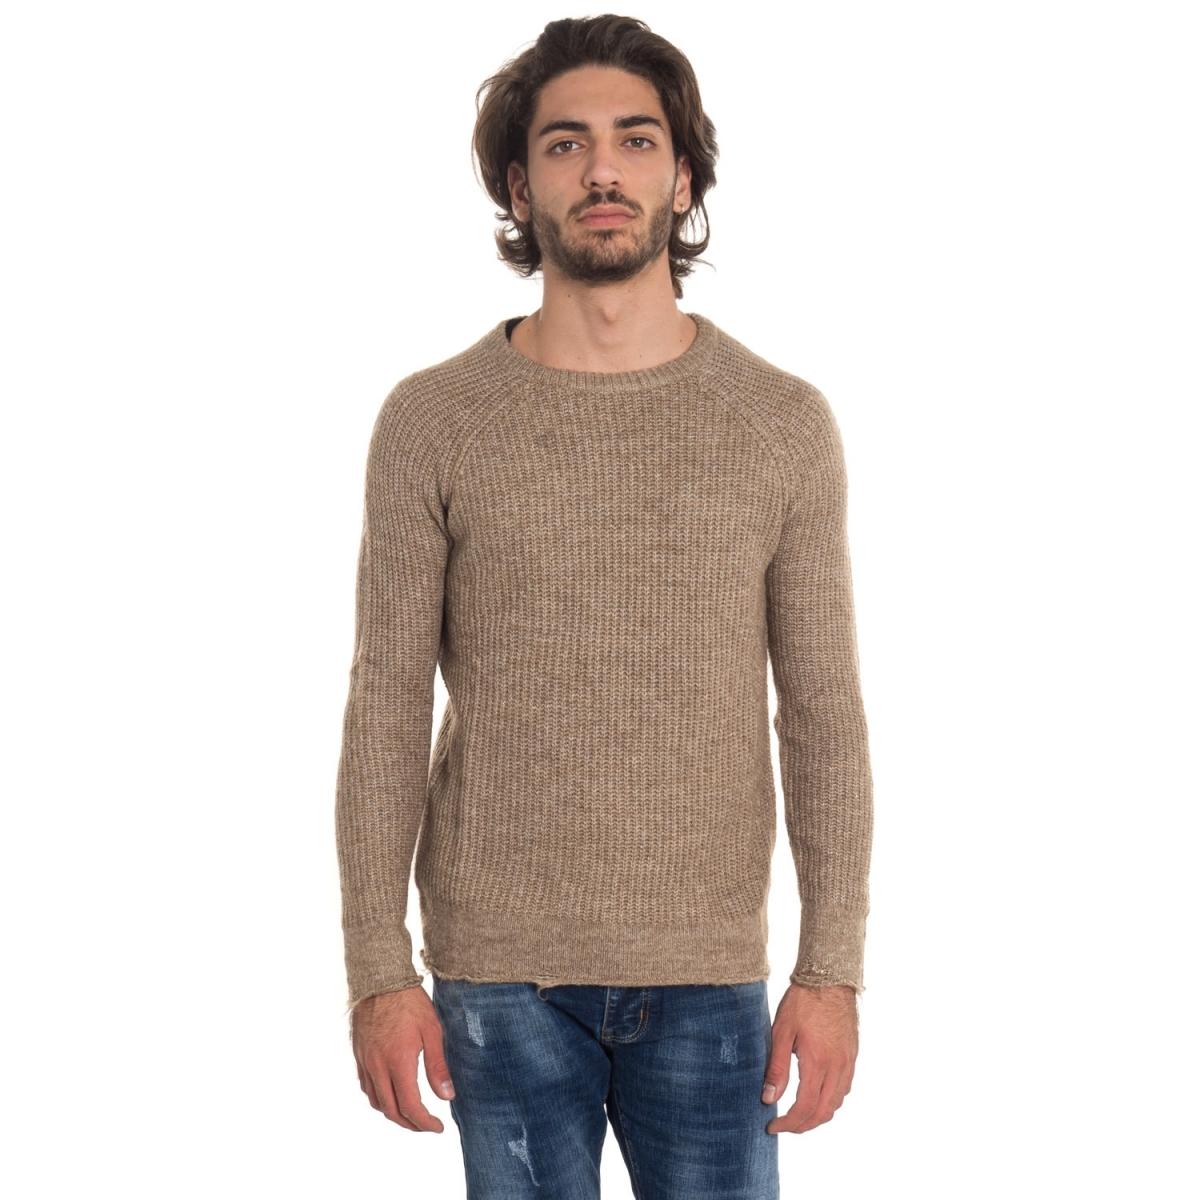 abbigliamento Maglieria uomo Maglia LPL315 LANDEK PARK Cafedelmar Shop